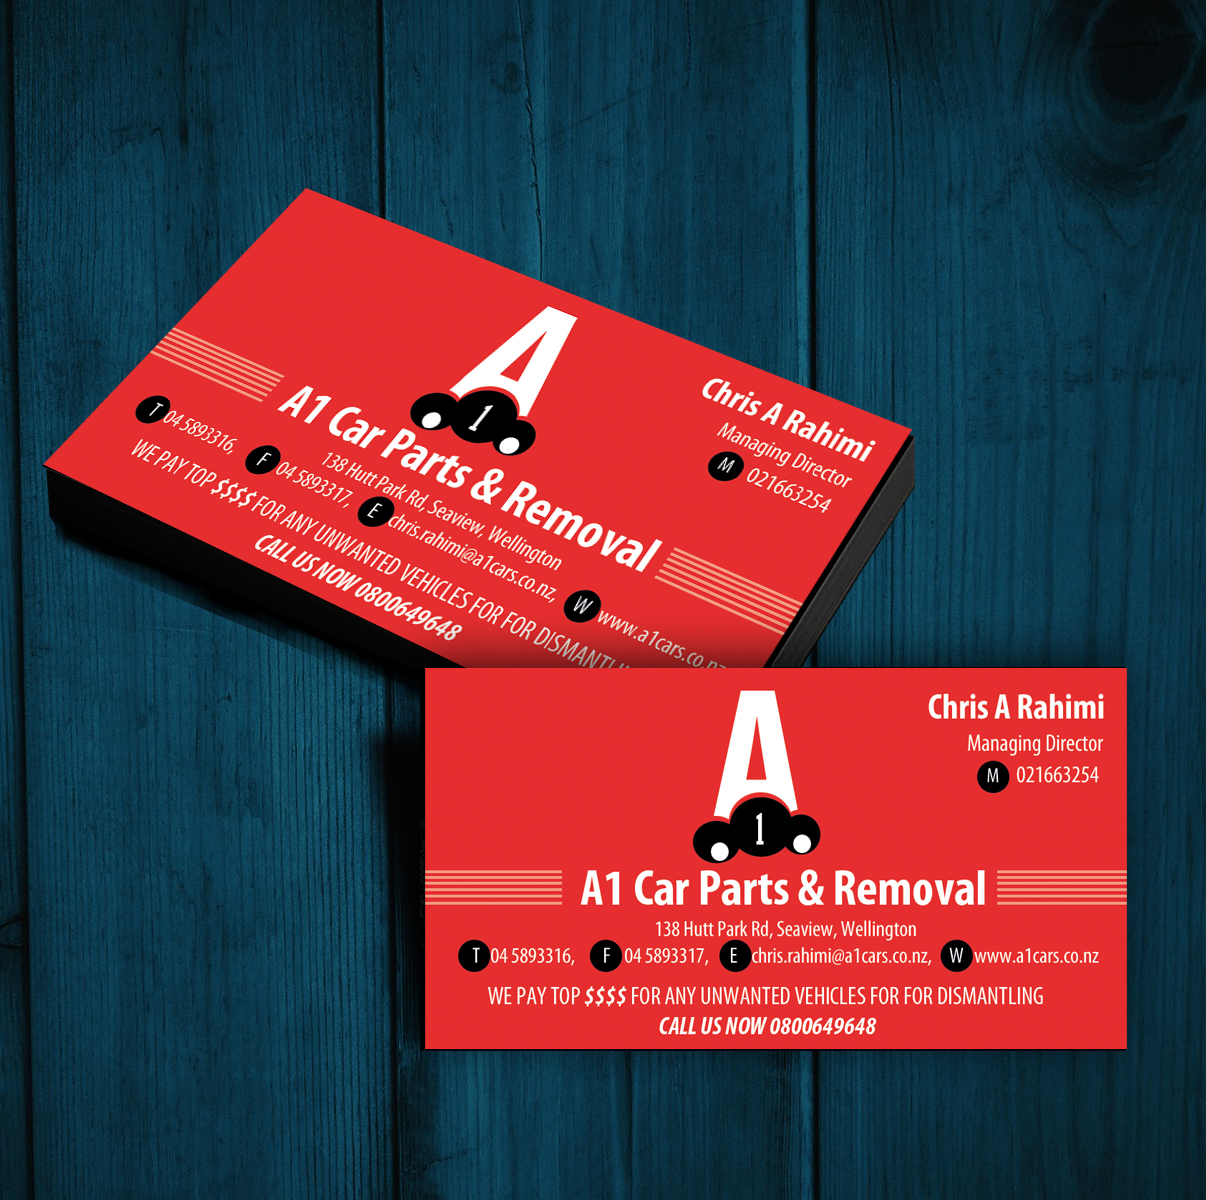 Business Card Design for Ali Rahimi by uk | Design #3489257